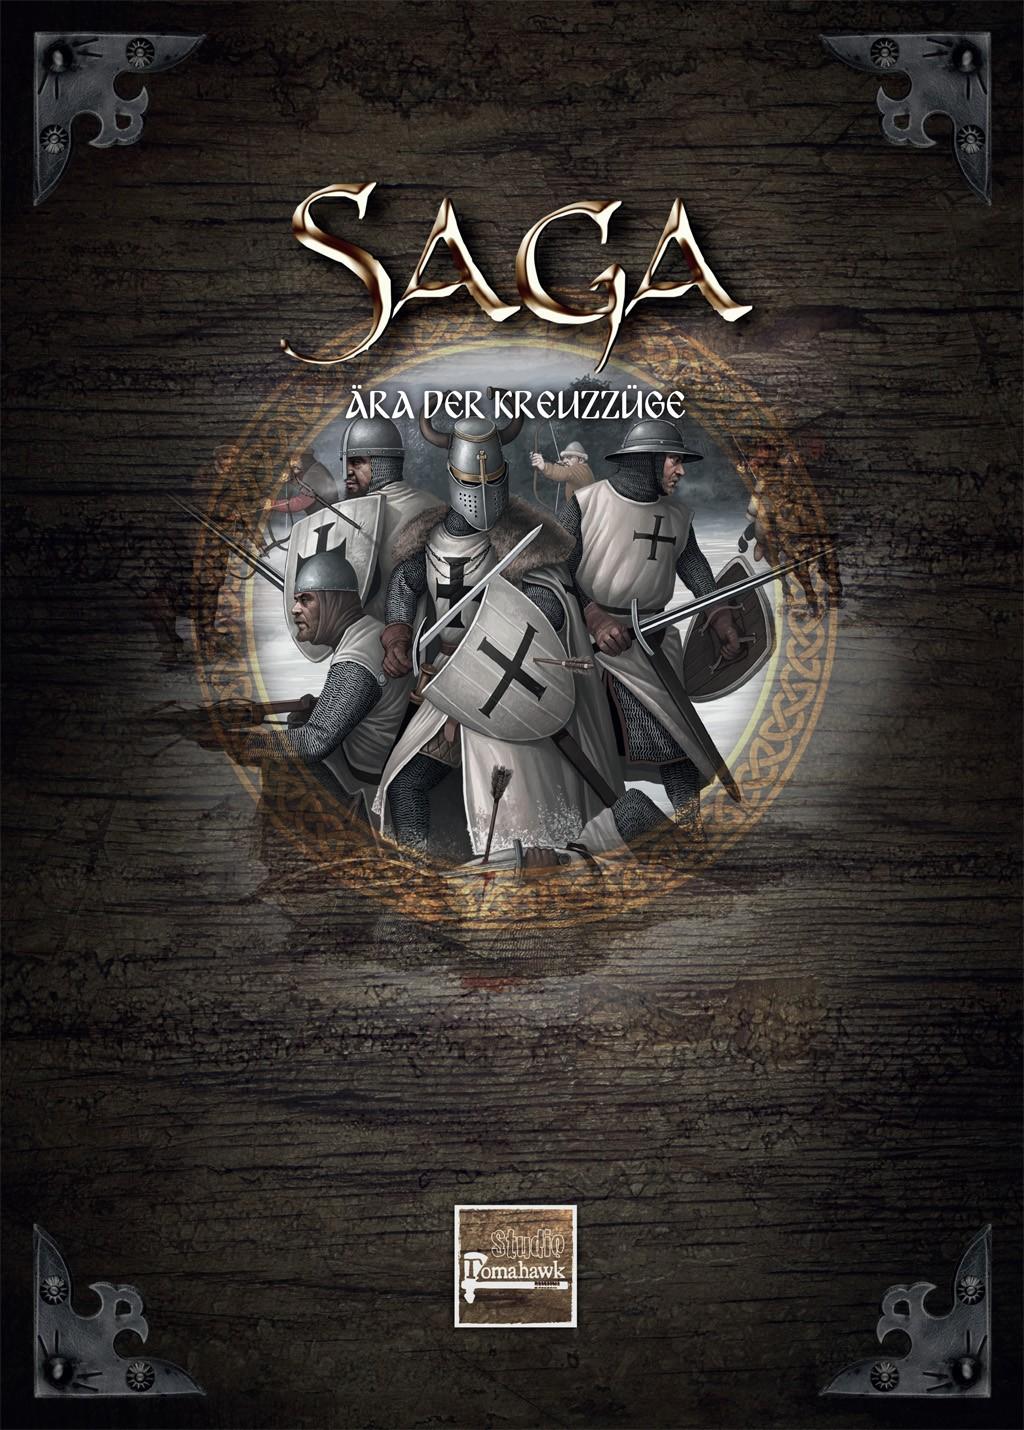 SAGA-Aera-der-Kreuzzuege-Cover.jpg